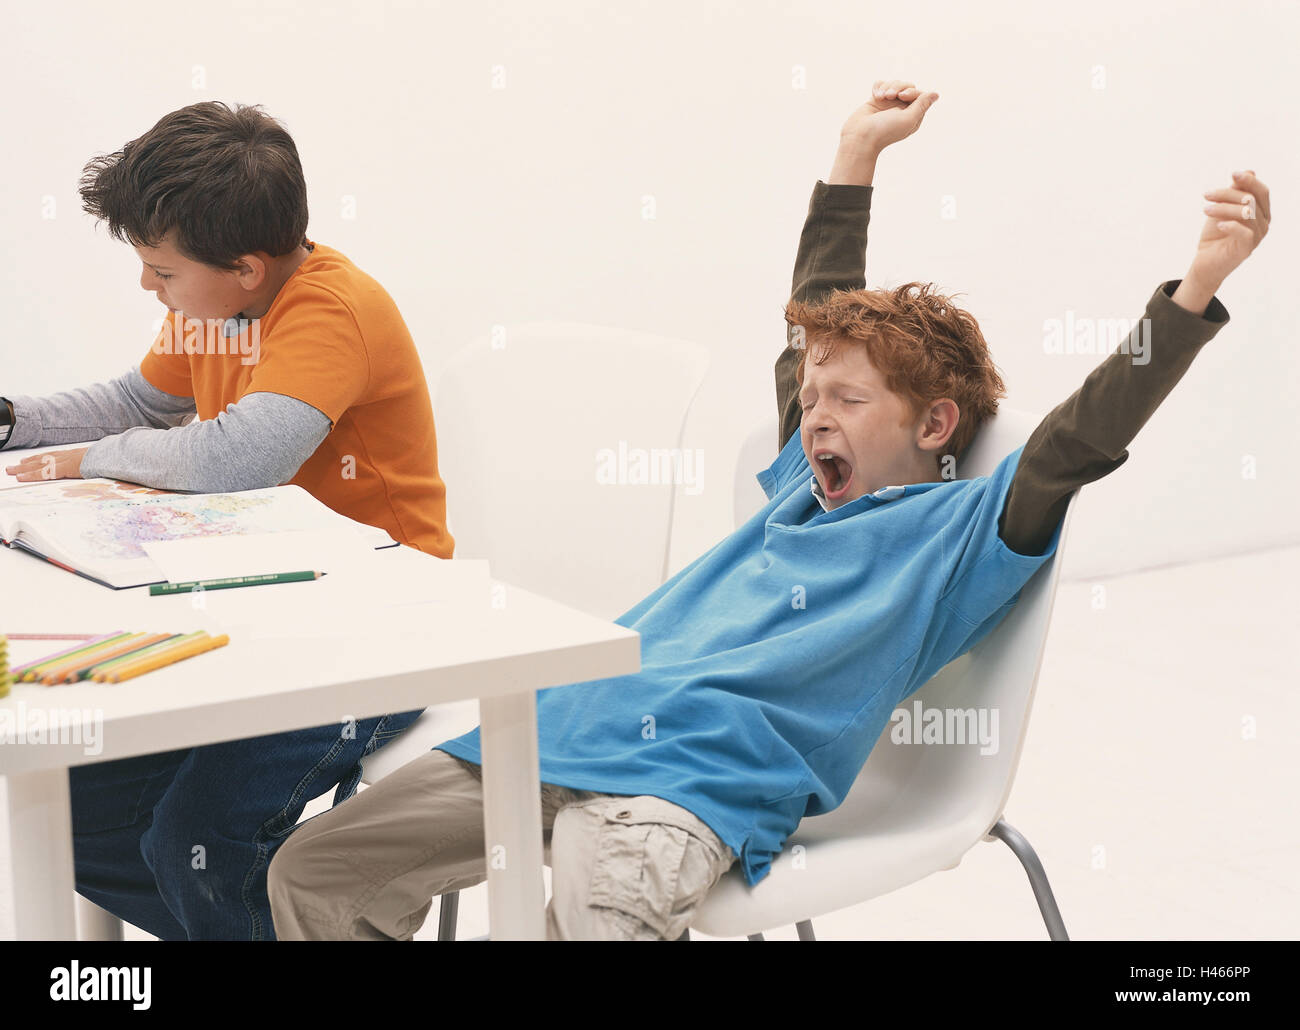 School, classroom, schoolboy, boy, yawn, stretch, school desk, person, school children, children, two, primary pupil, - Stock Image